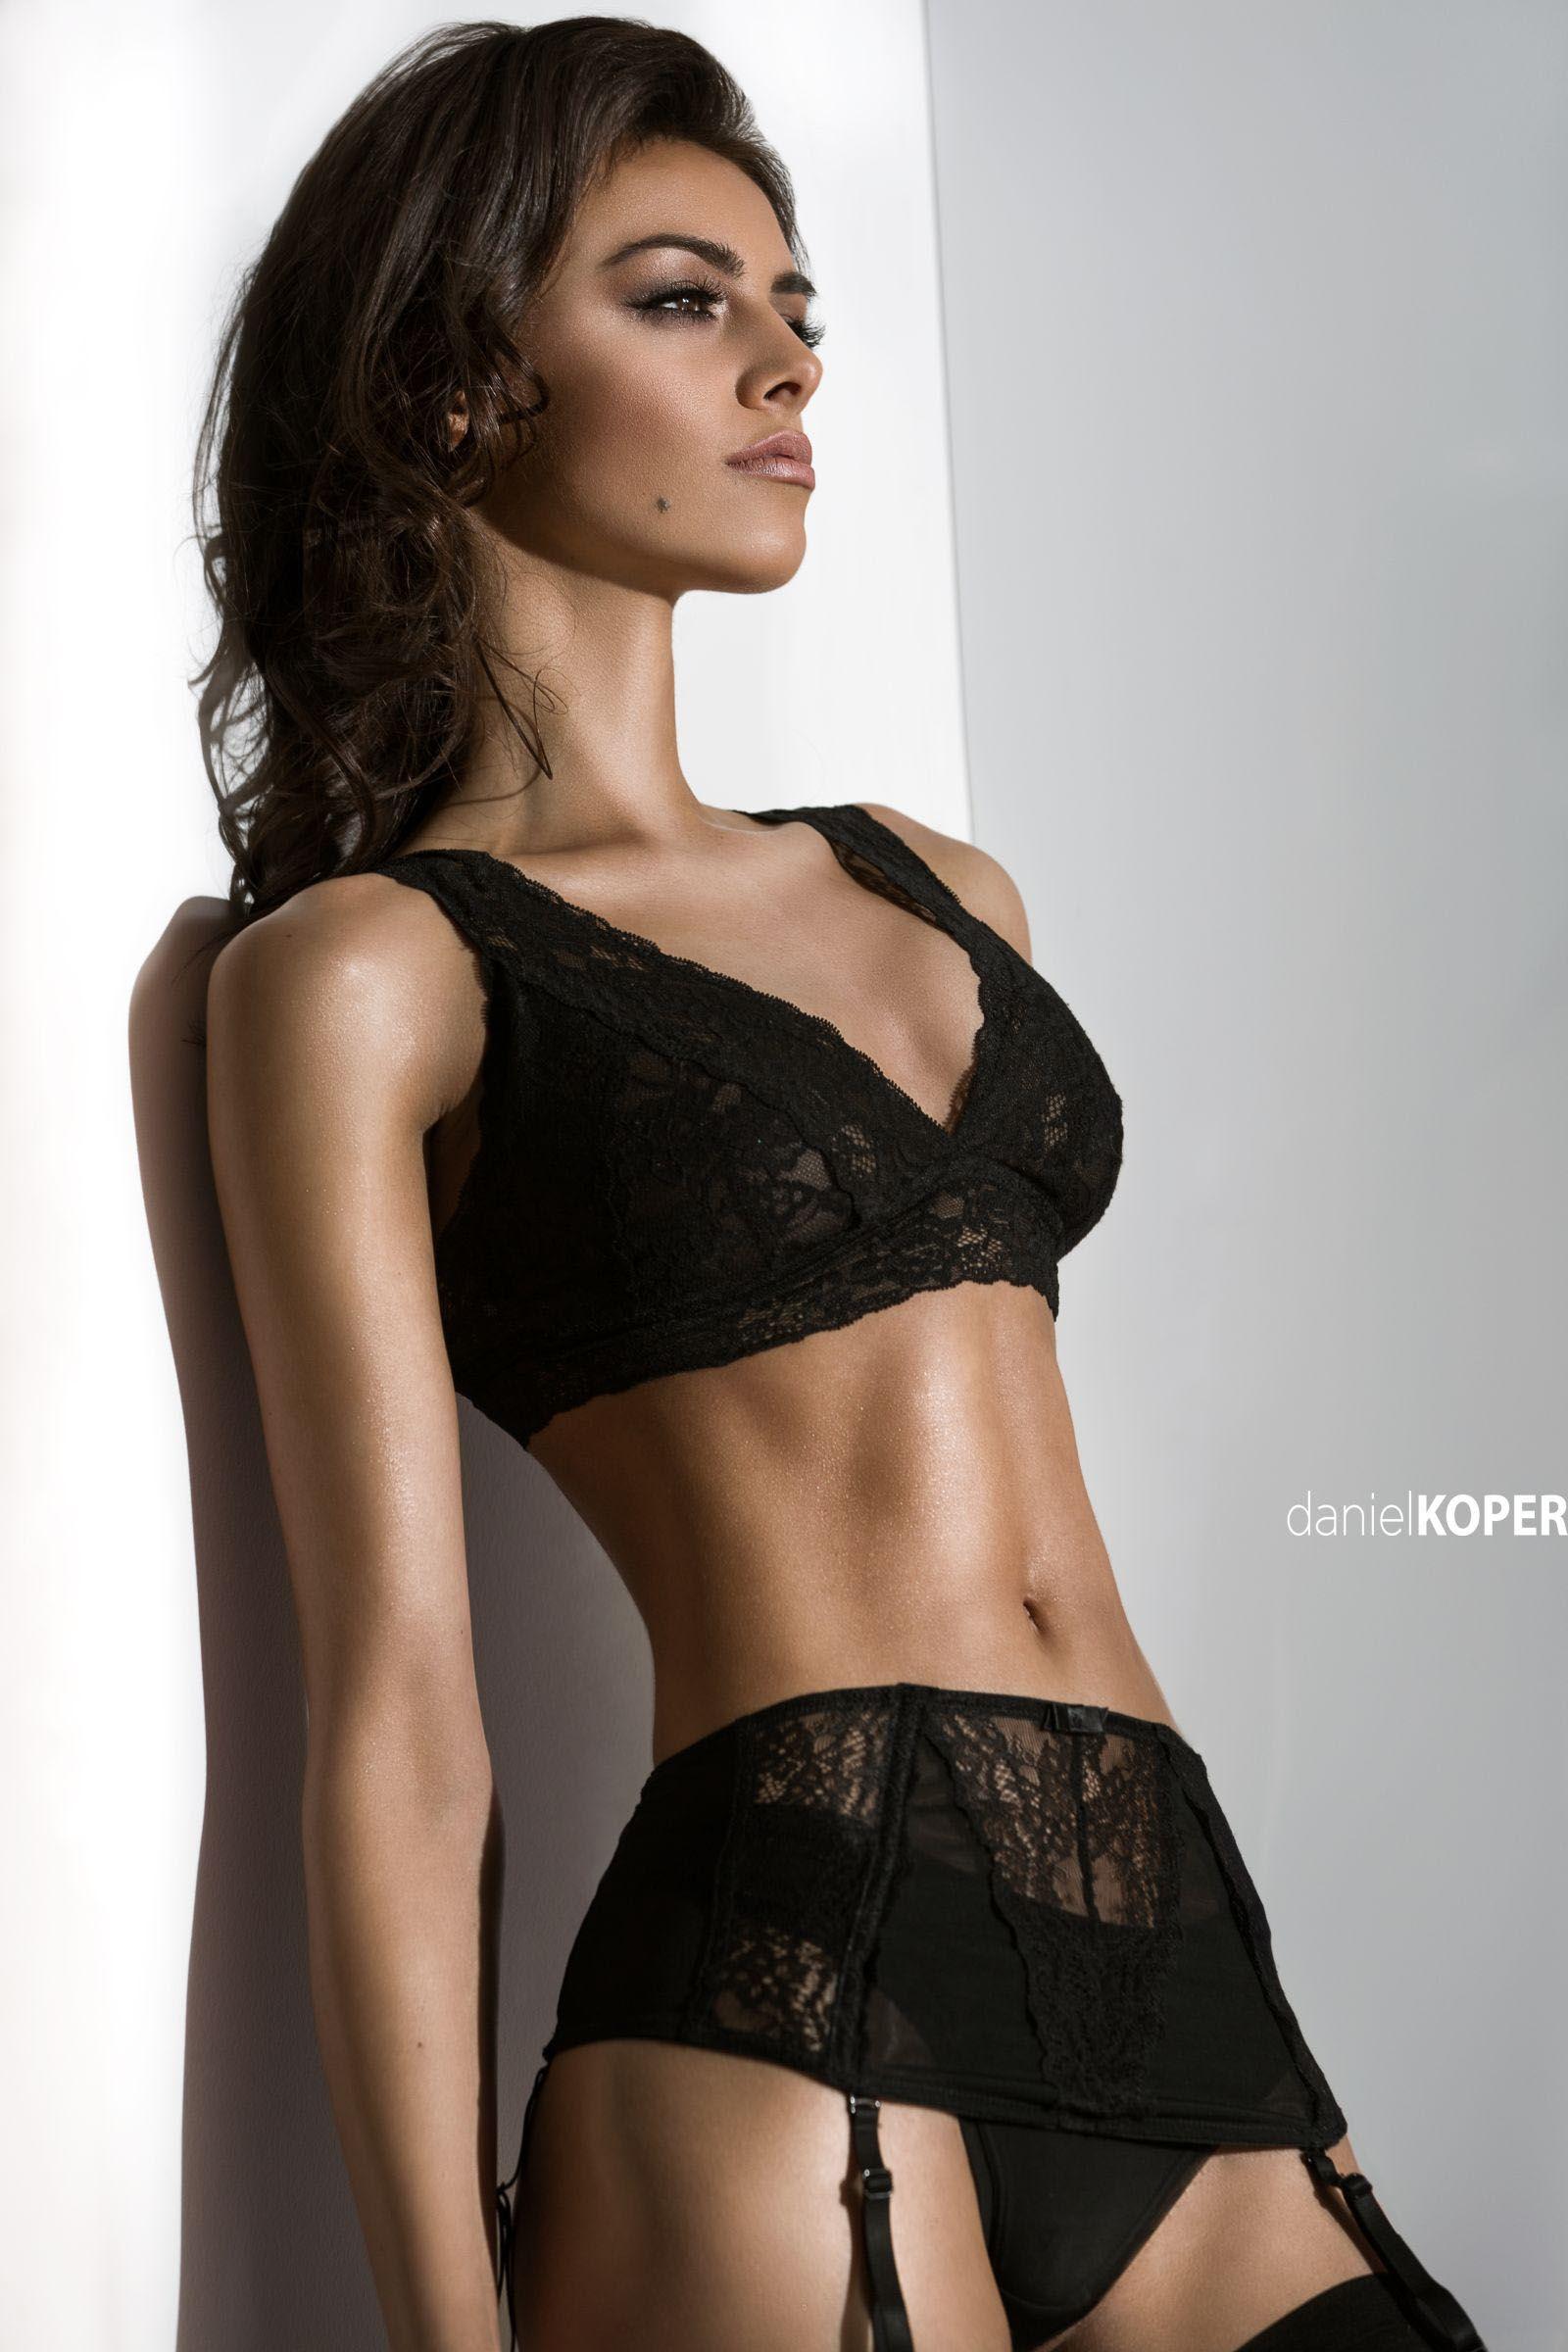 Hot Anita Sikorska naked (91 photo), Tits, Sideboobs, Twitter, butt 2020